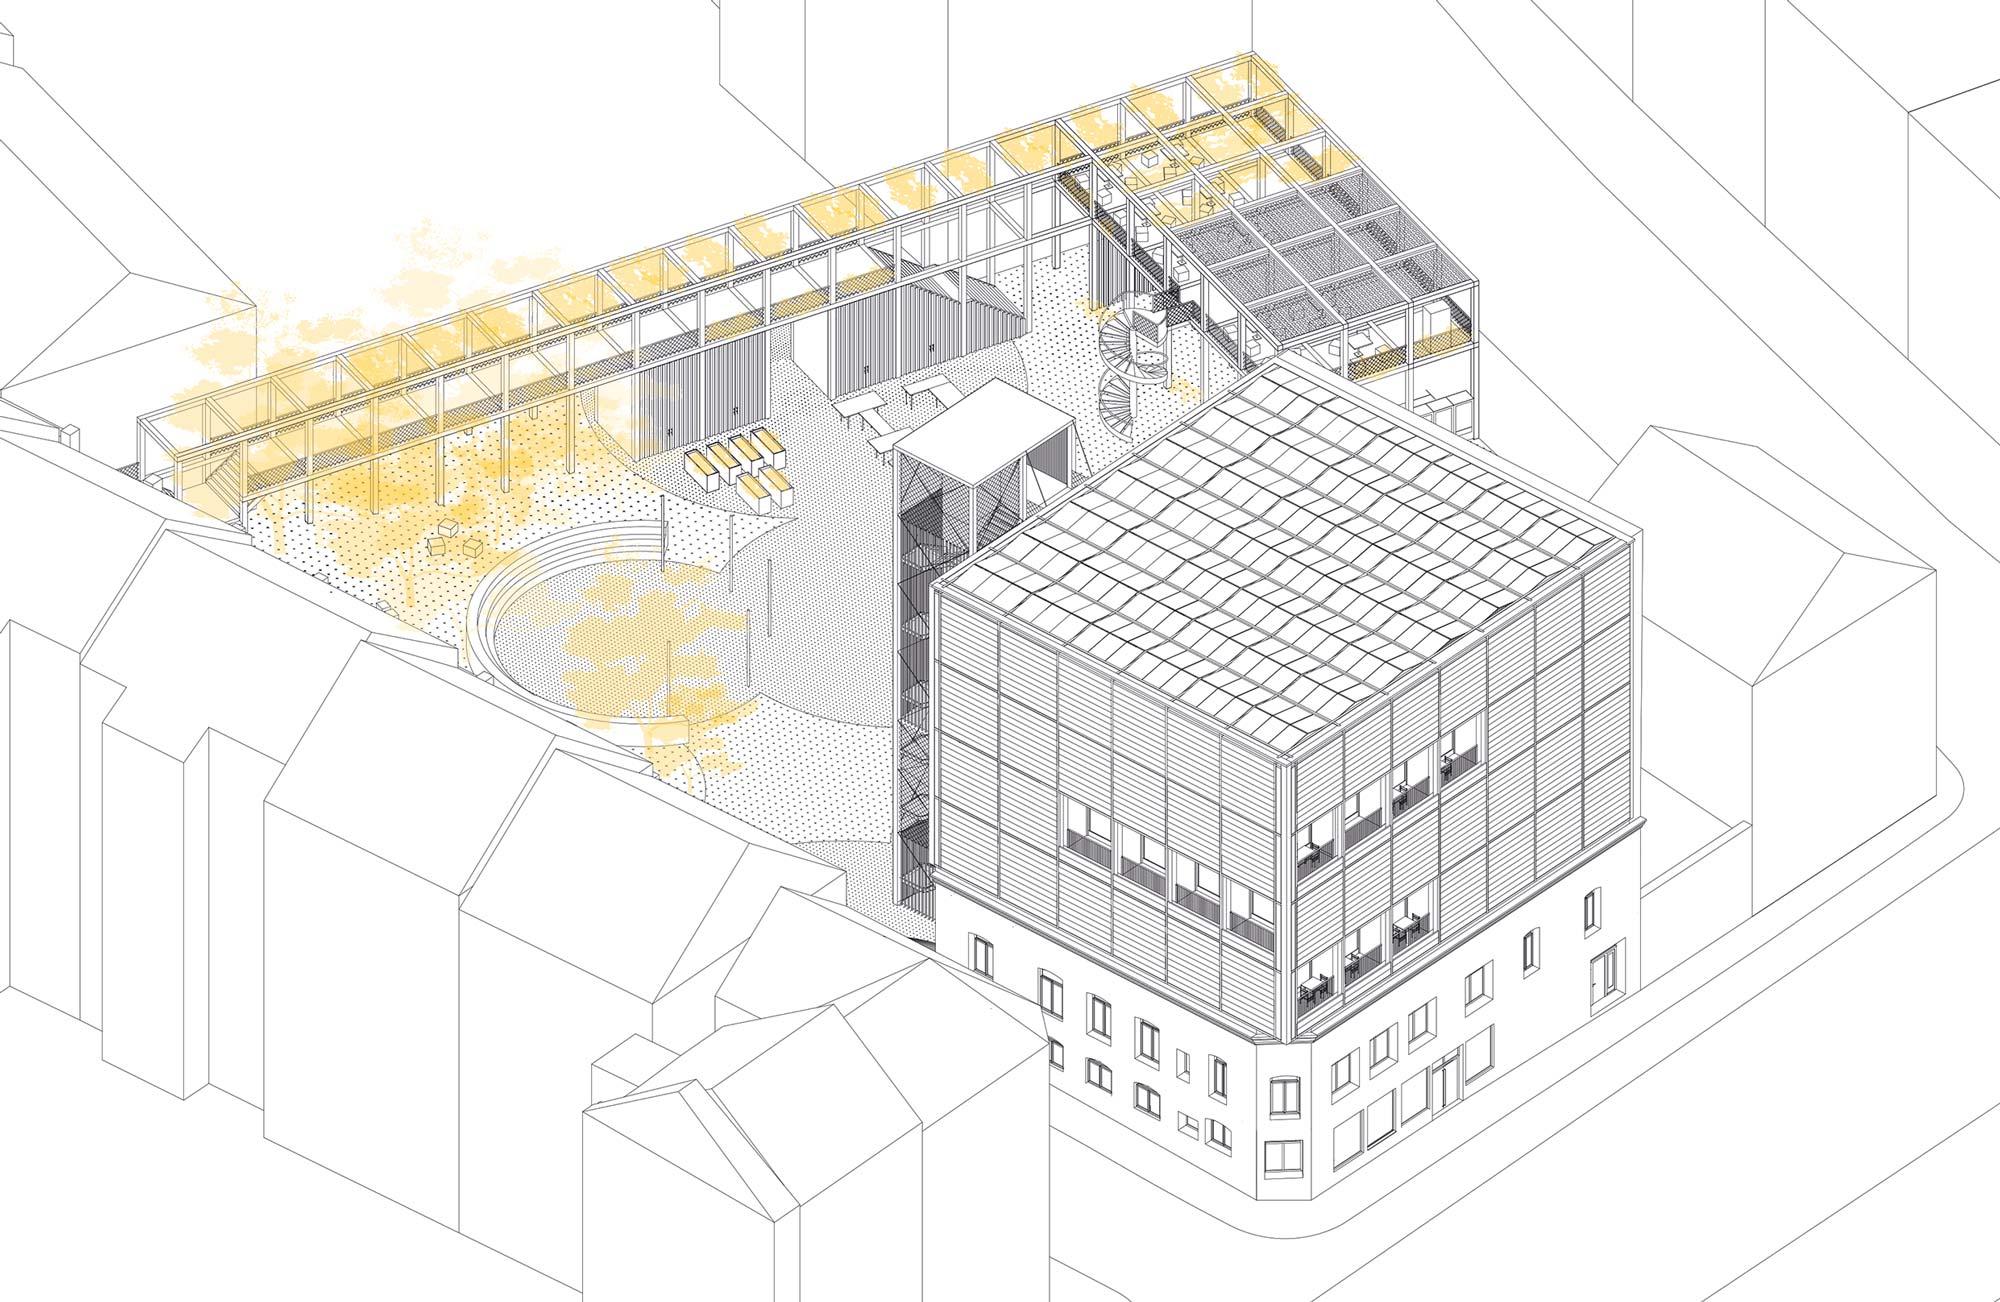 MIMOs Erweiterung des Cafe Ada in Wuppertal, Mirke. Solar Decathlon Europa 21/22